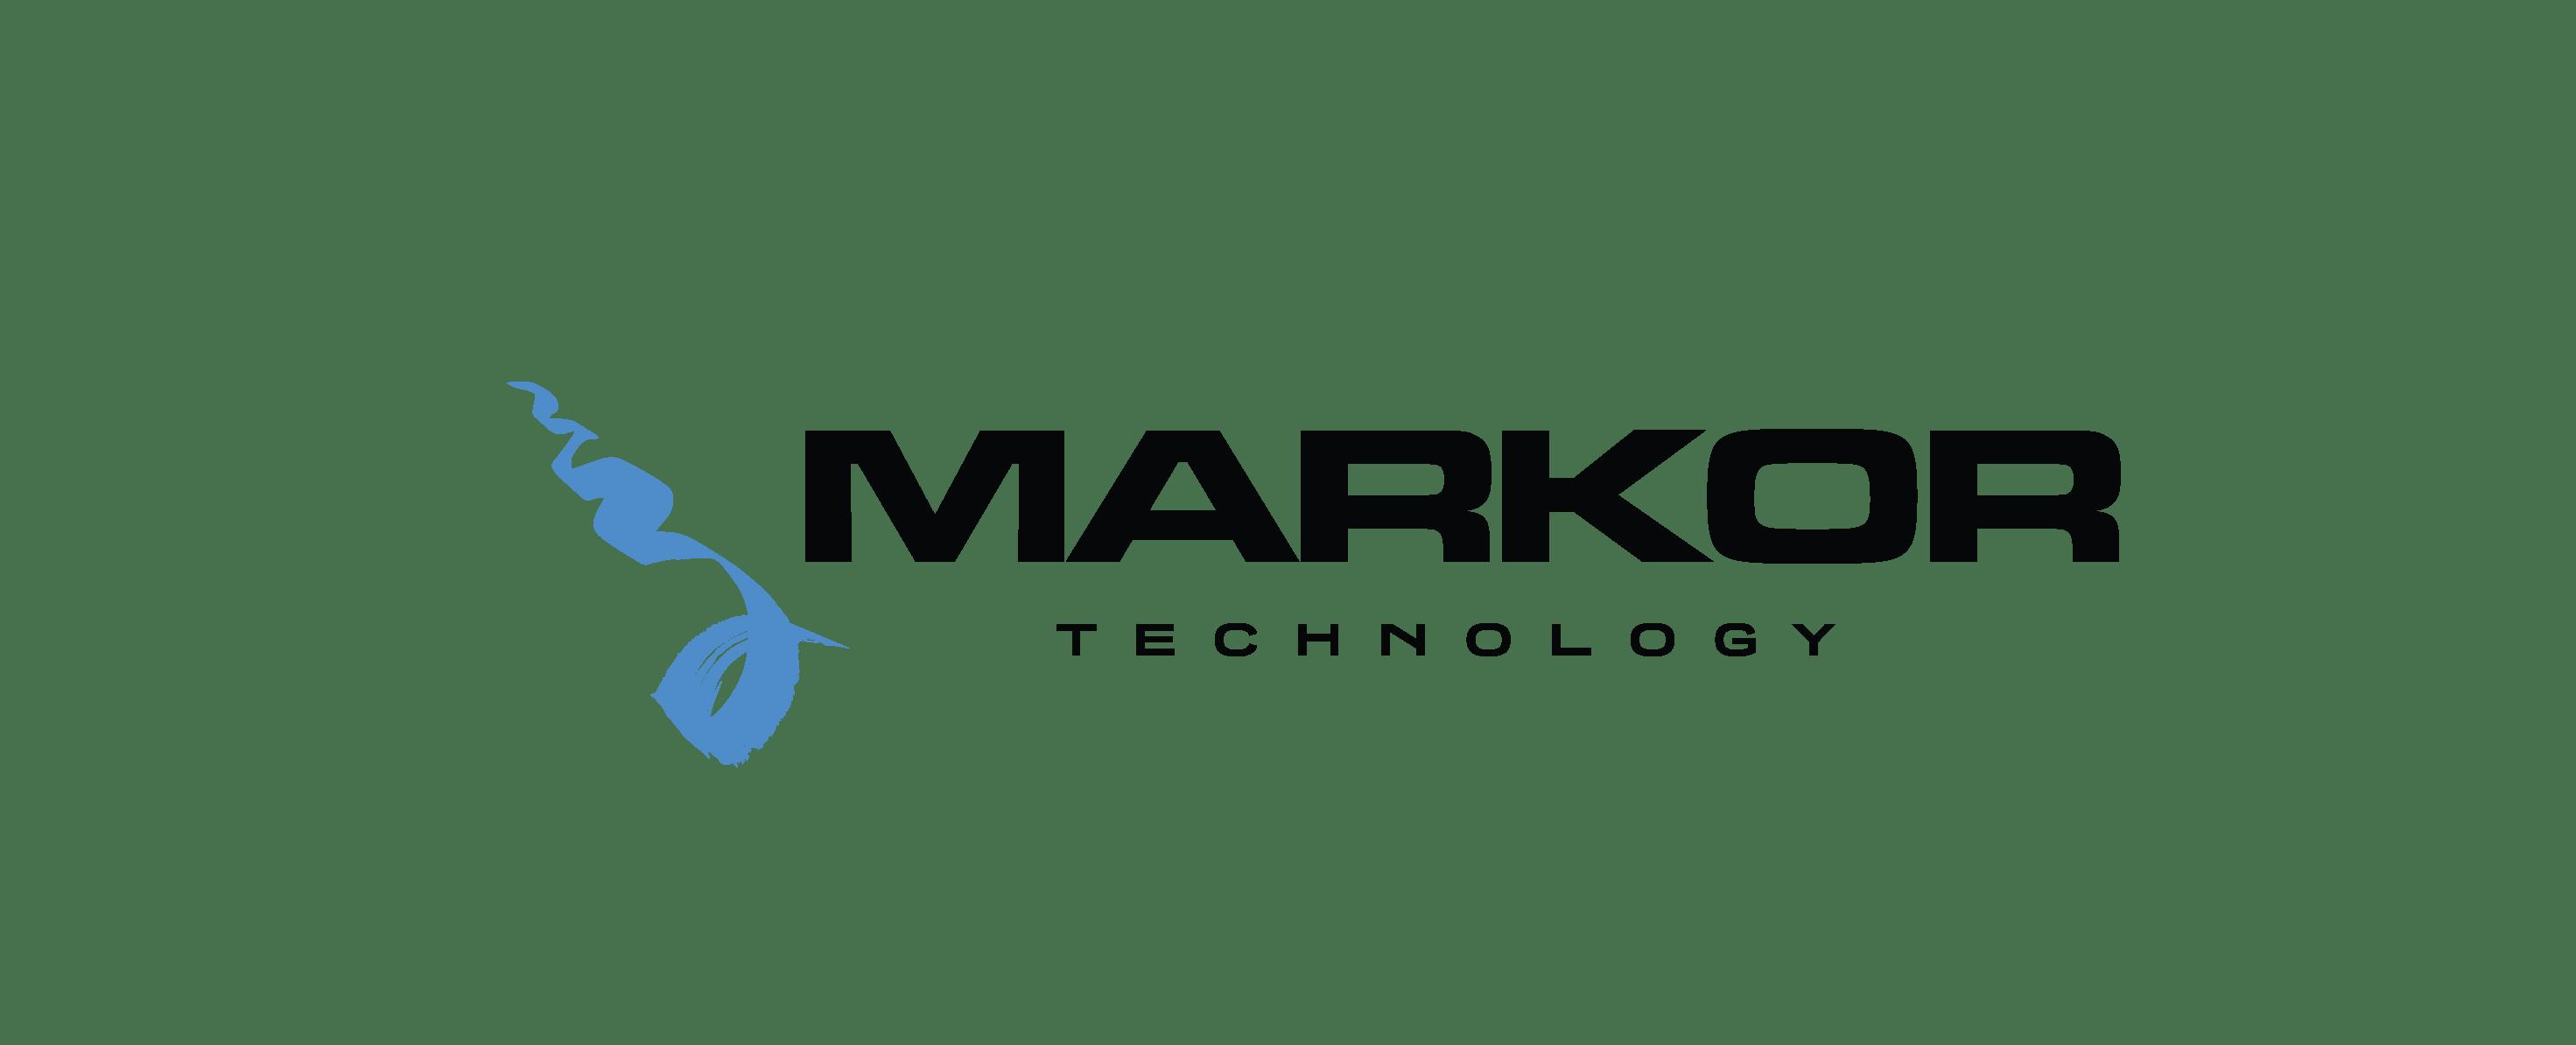 Markor Technology игры